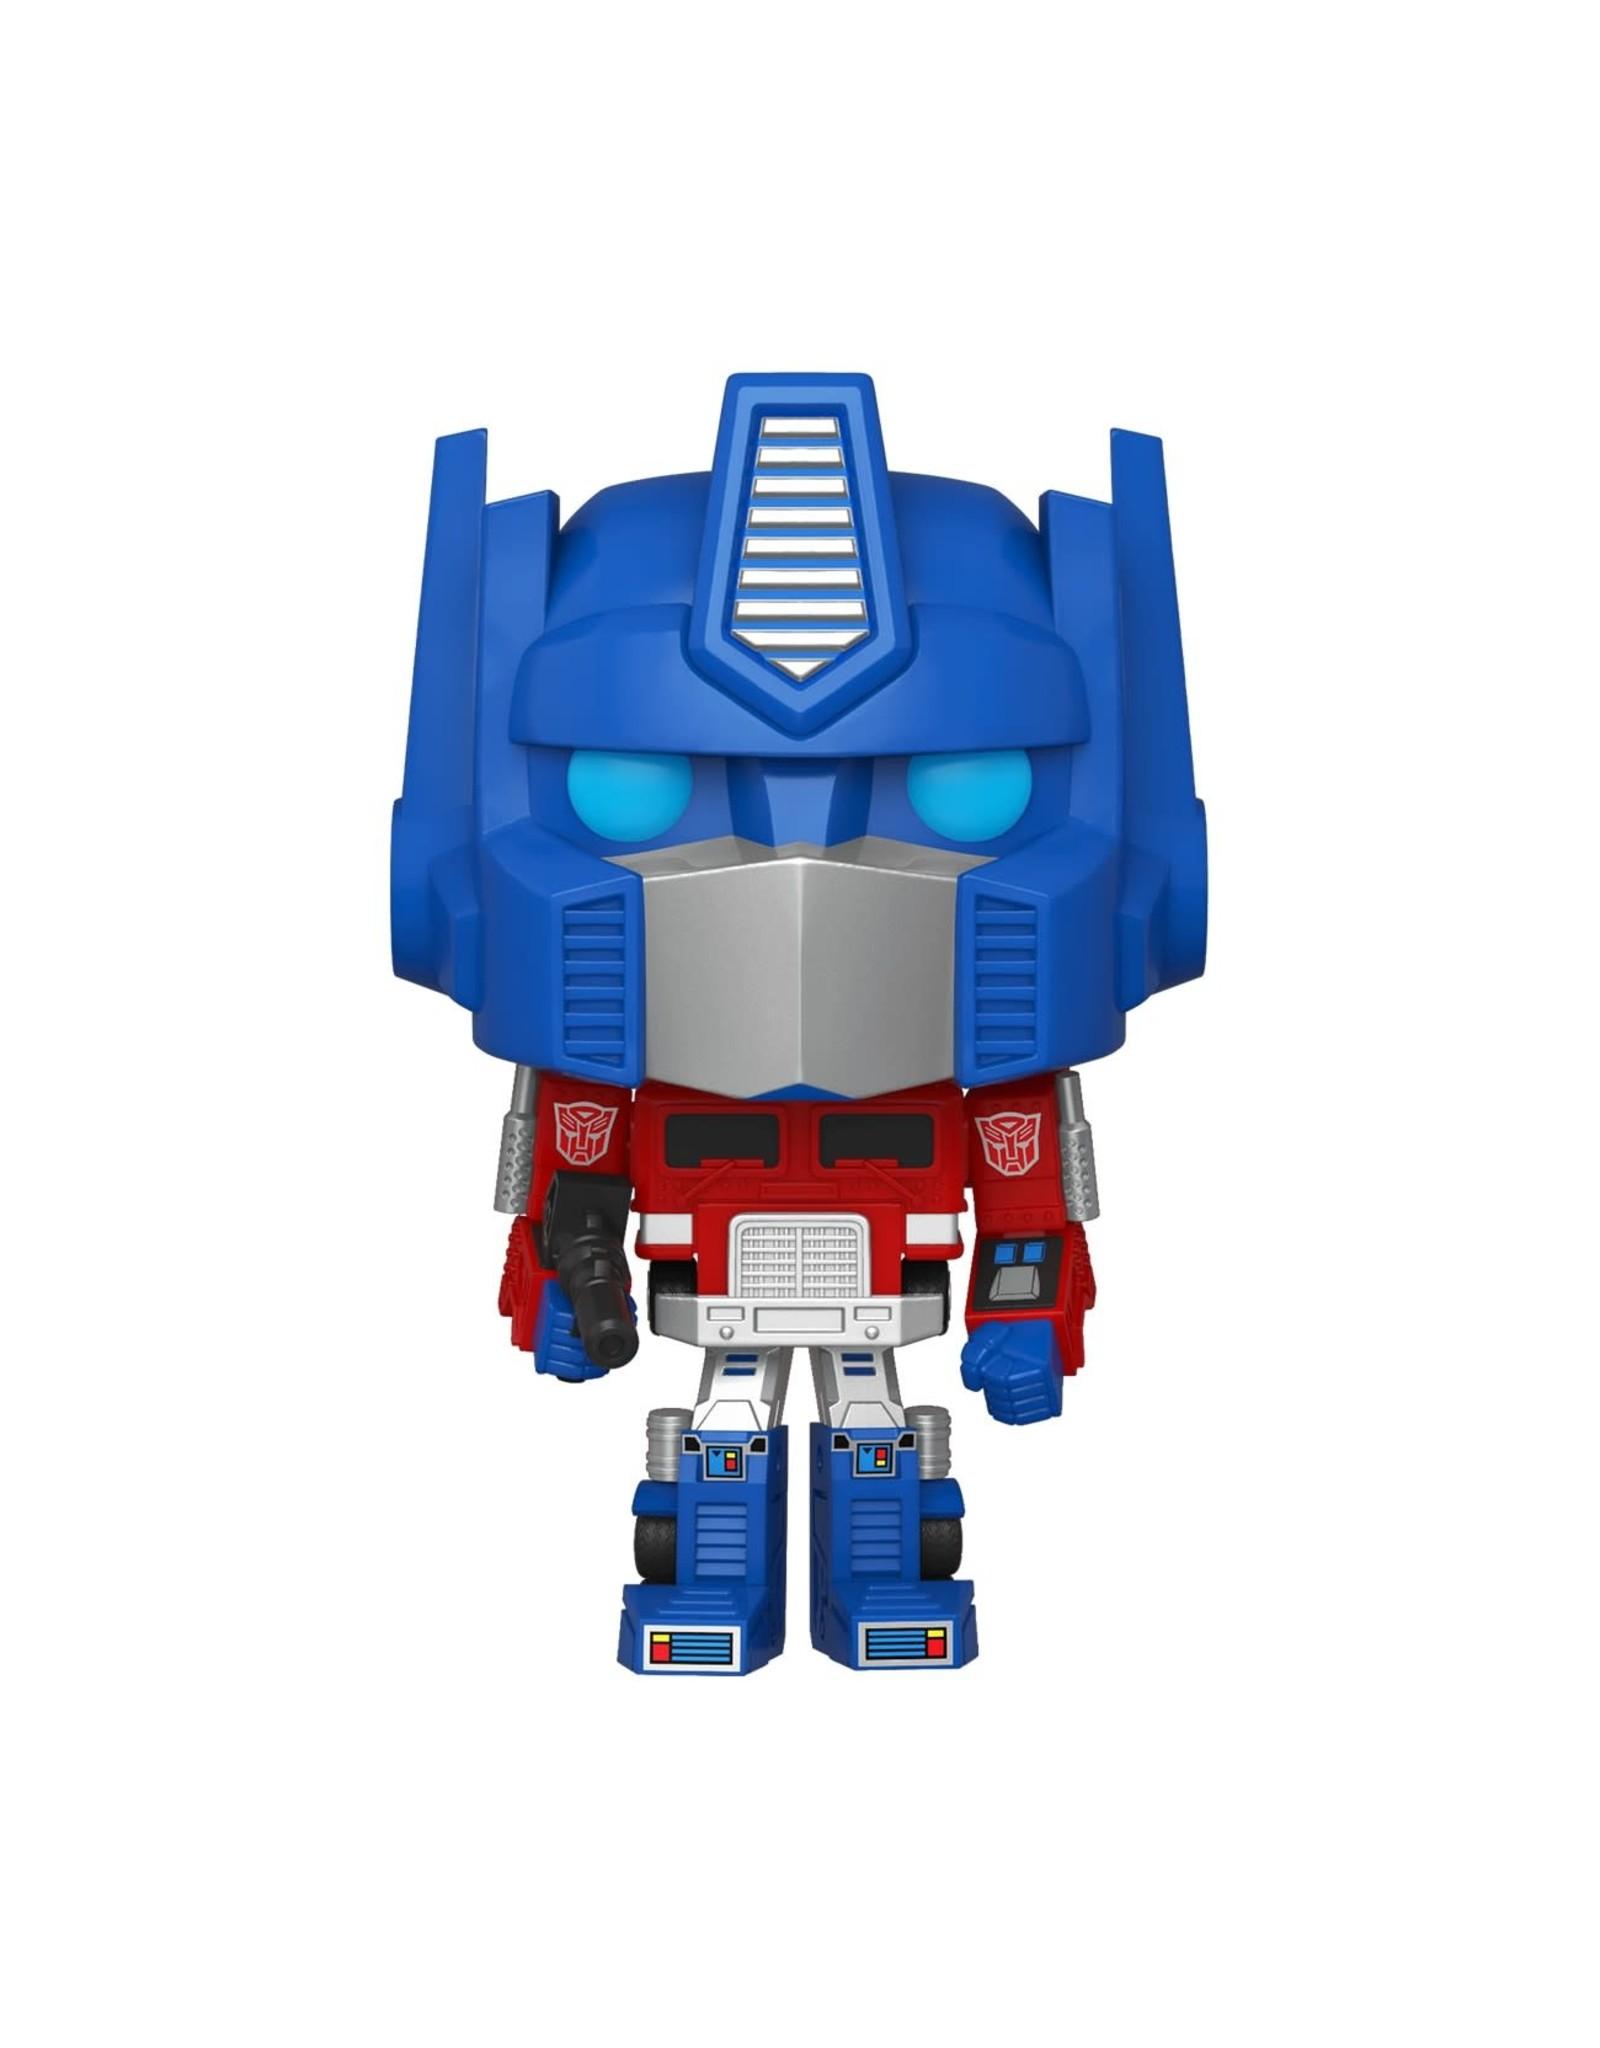 Funko Pop! Funko Pop! Retro Toys nr022 Transformers Optimus Prime